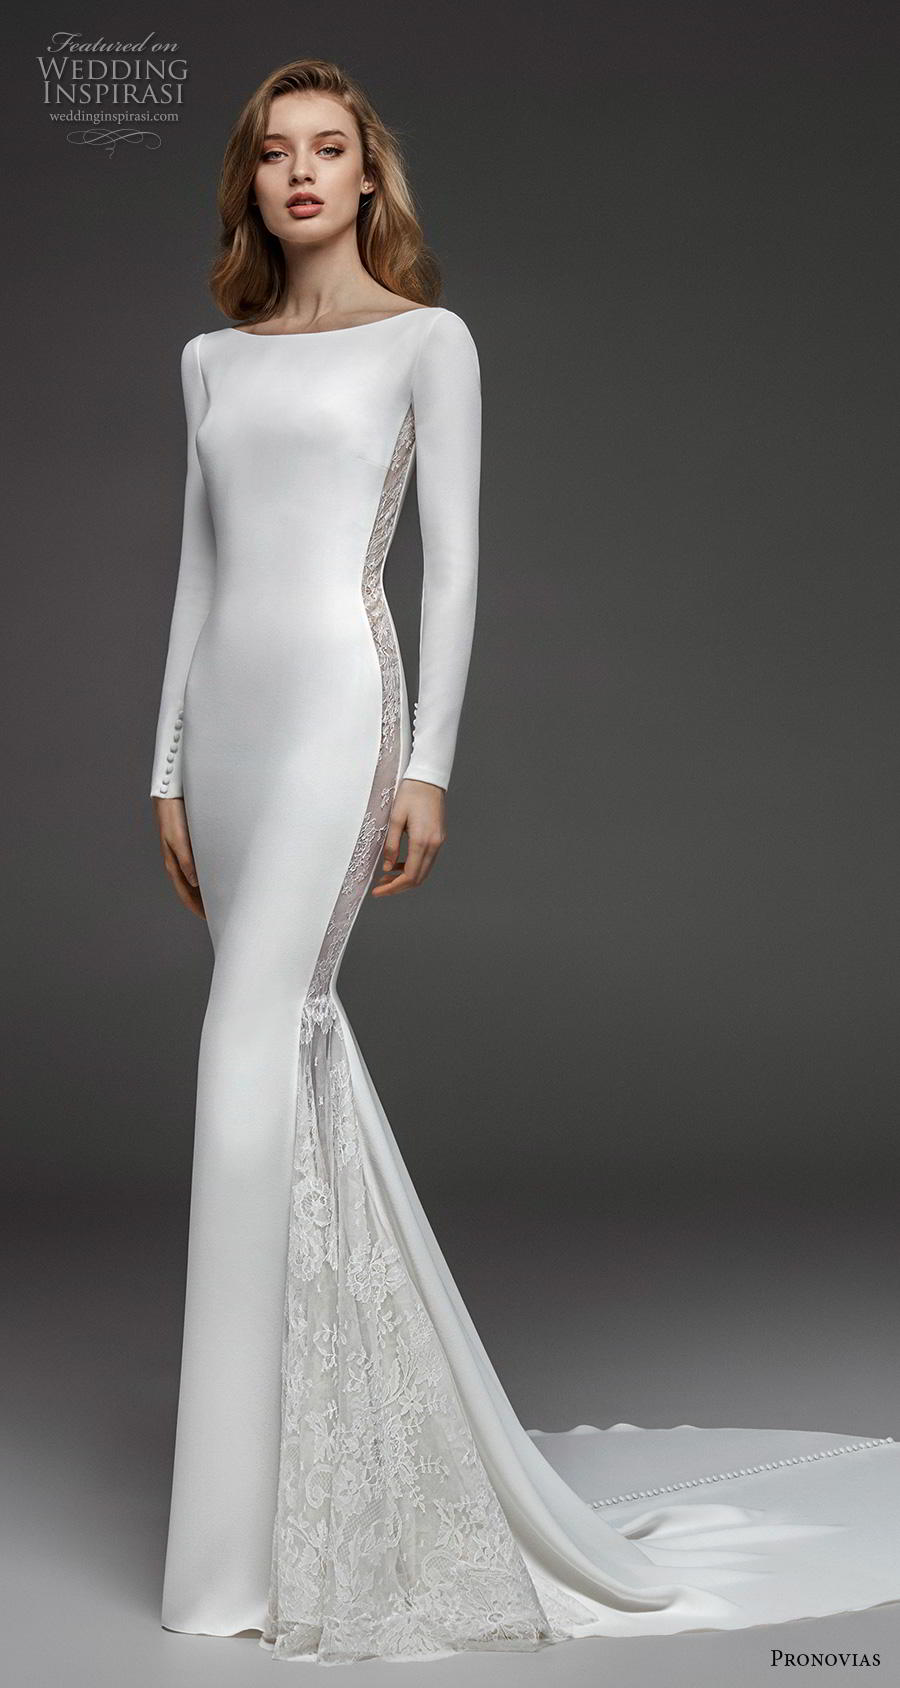 atelier pronovias 2019 bridal long sleeves bateau neckline simple minimalist elegant fit and flare wedding dress backless low v back chapel train (19) mv